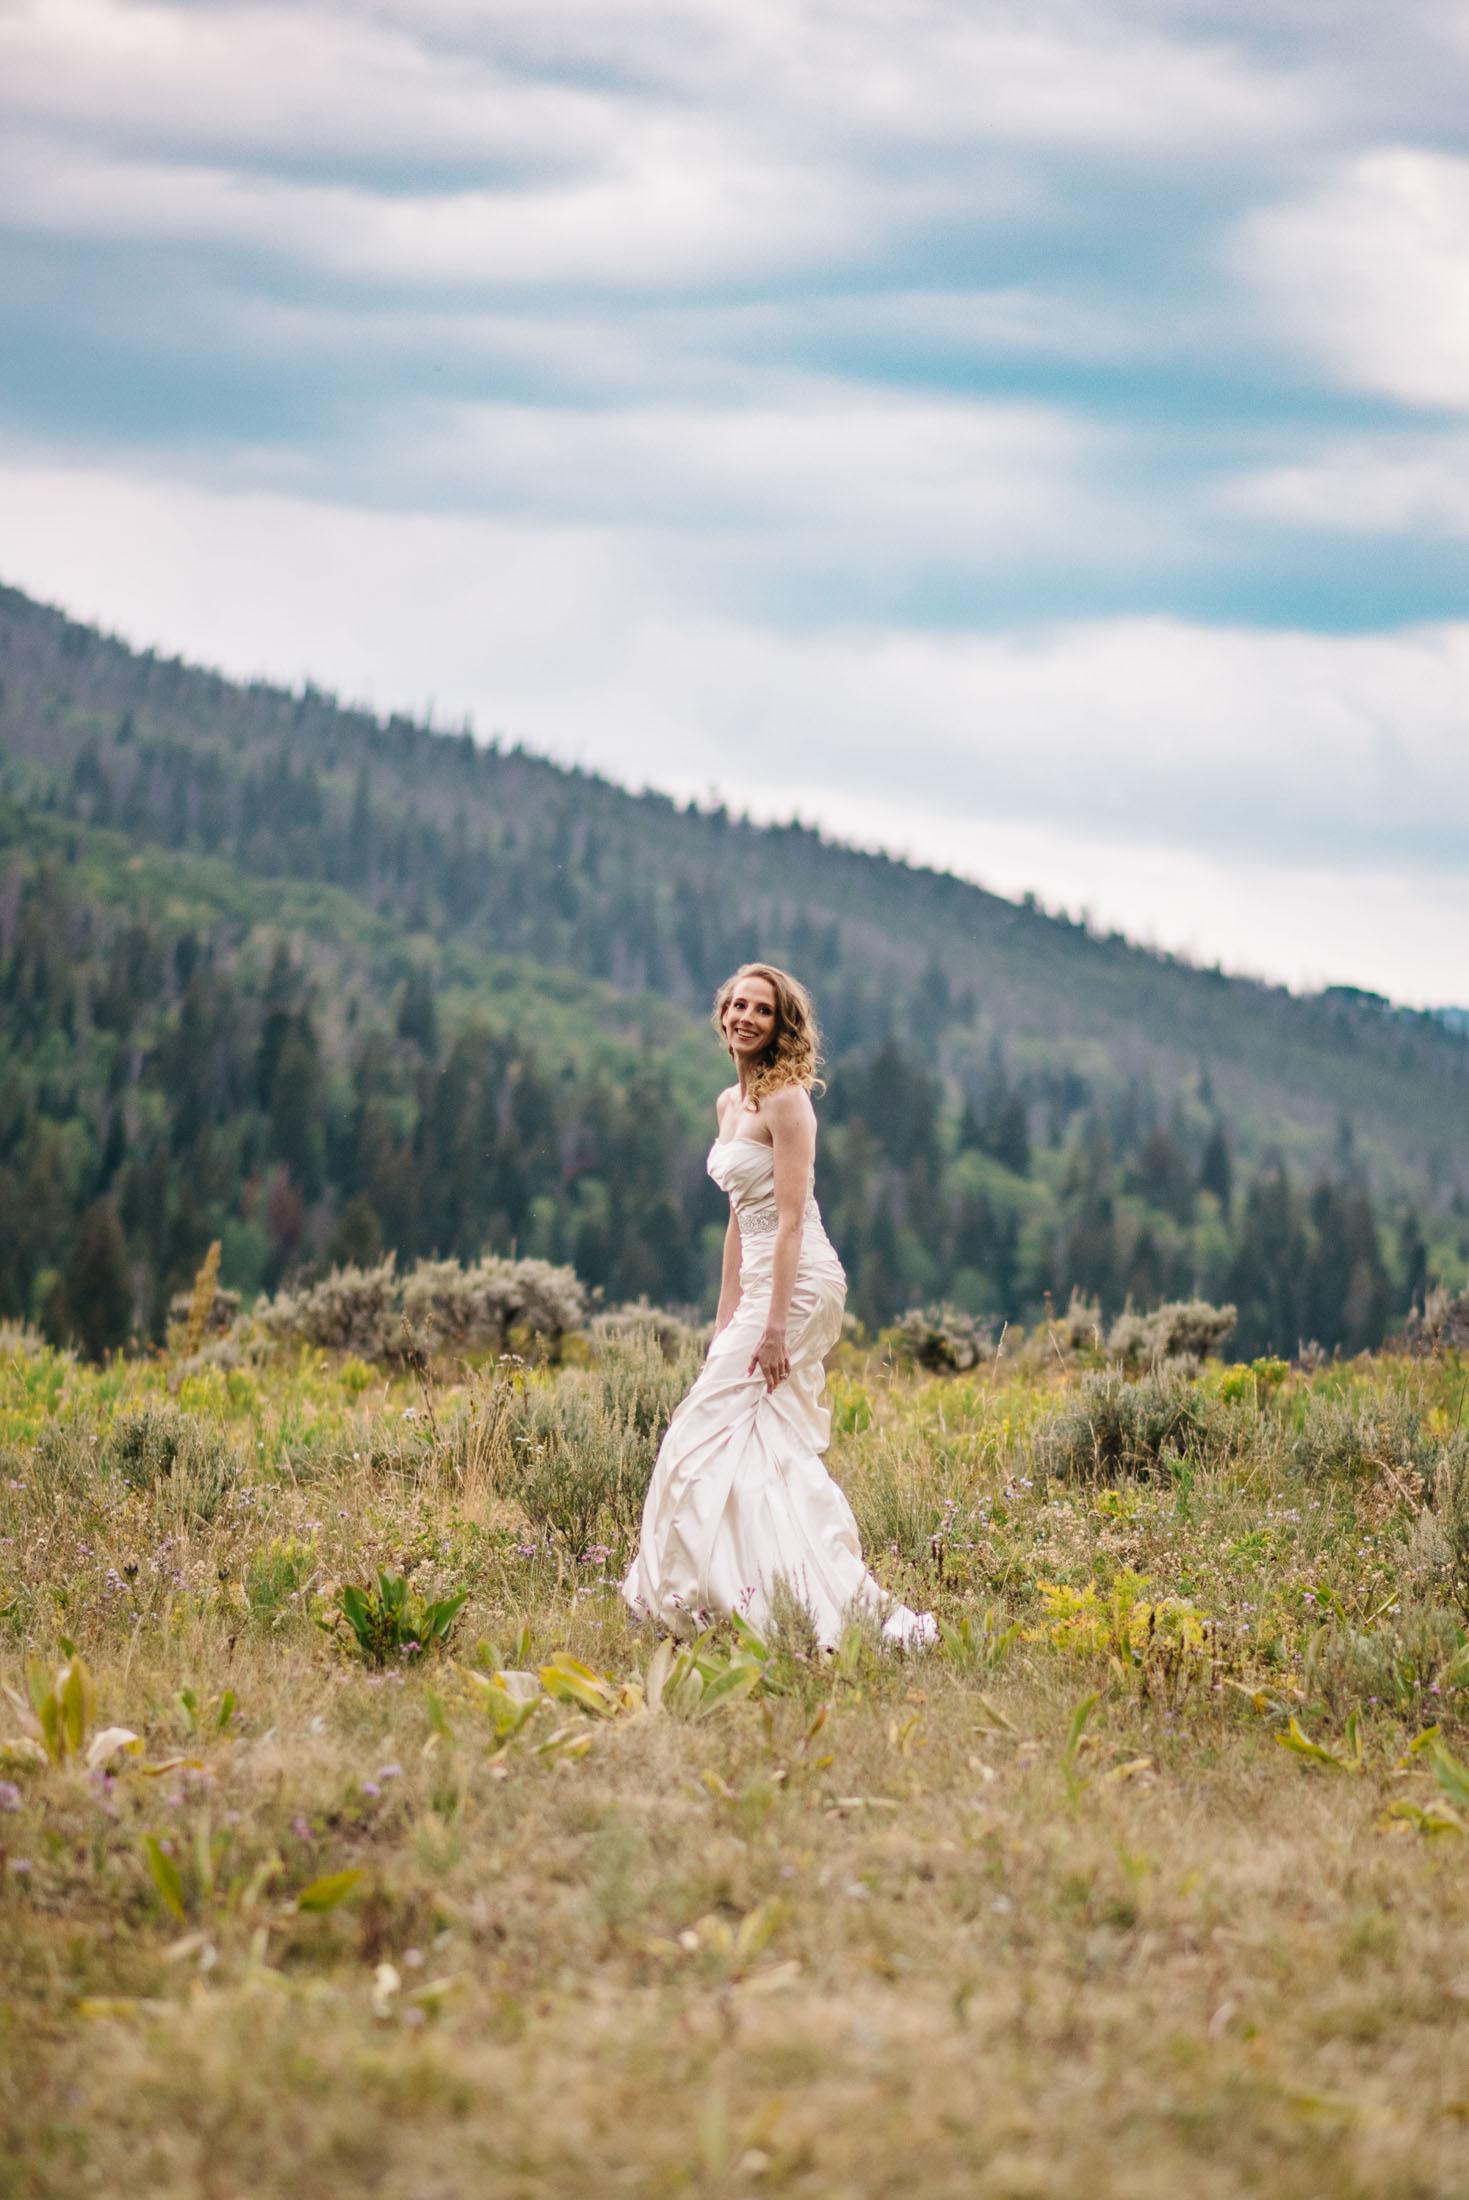 114elopement-photographer-colorado-snow-mountain-ranch-wedding-cynthia&chris-married1400.jpg